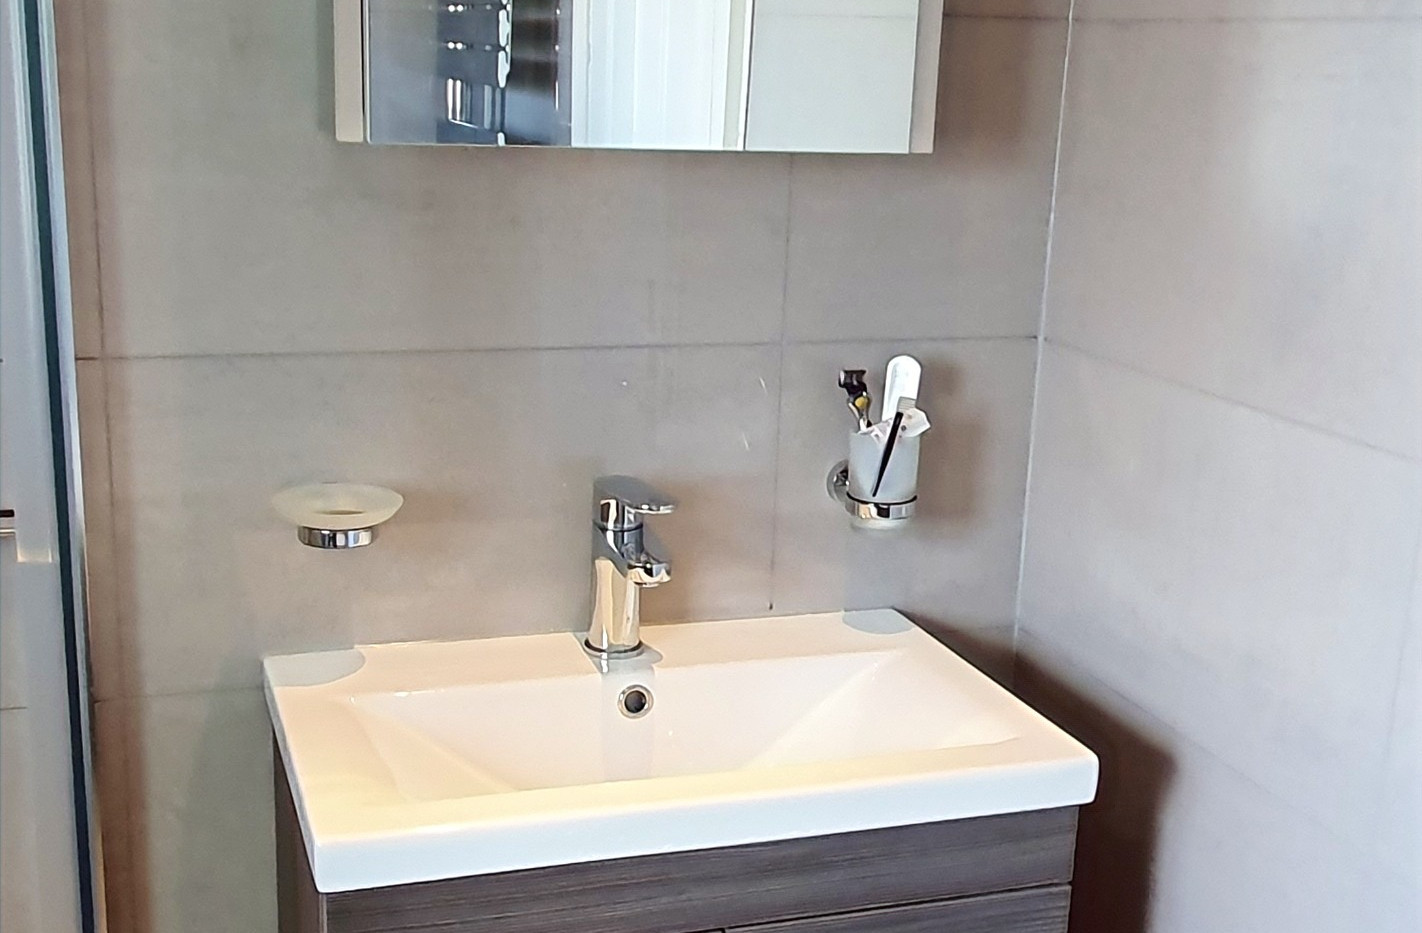 Bathroom sink unit mirror tiling flooring